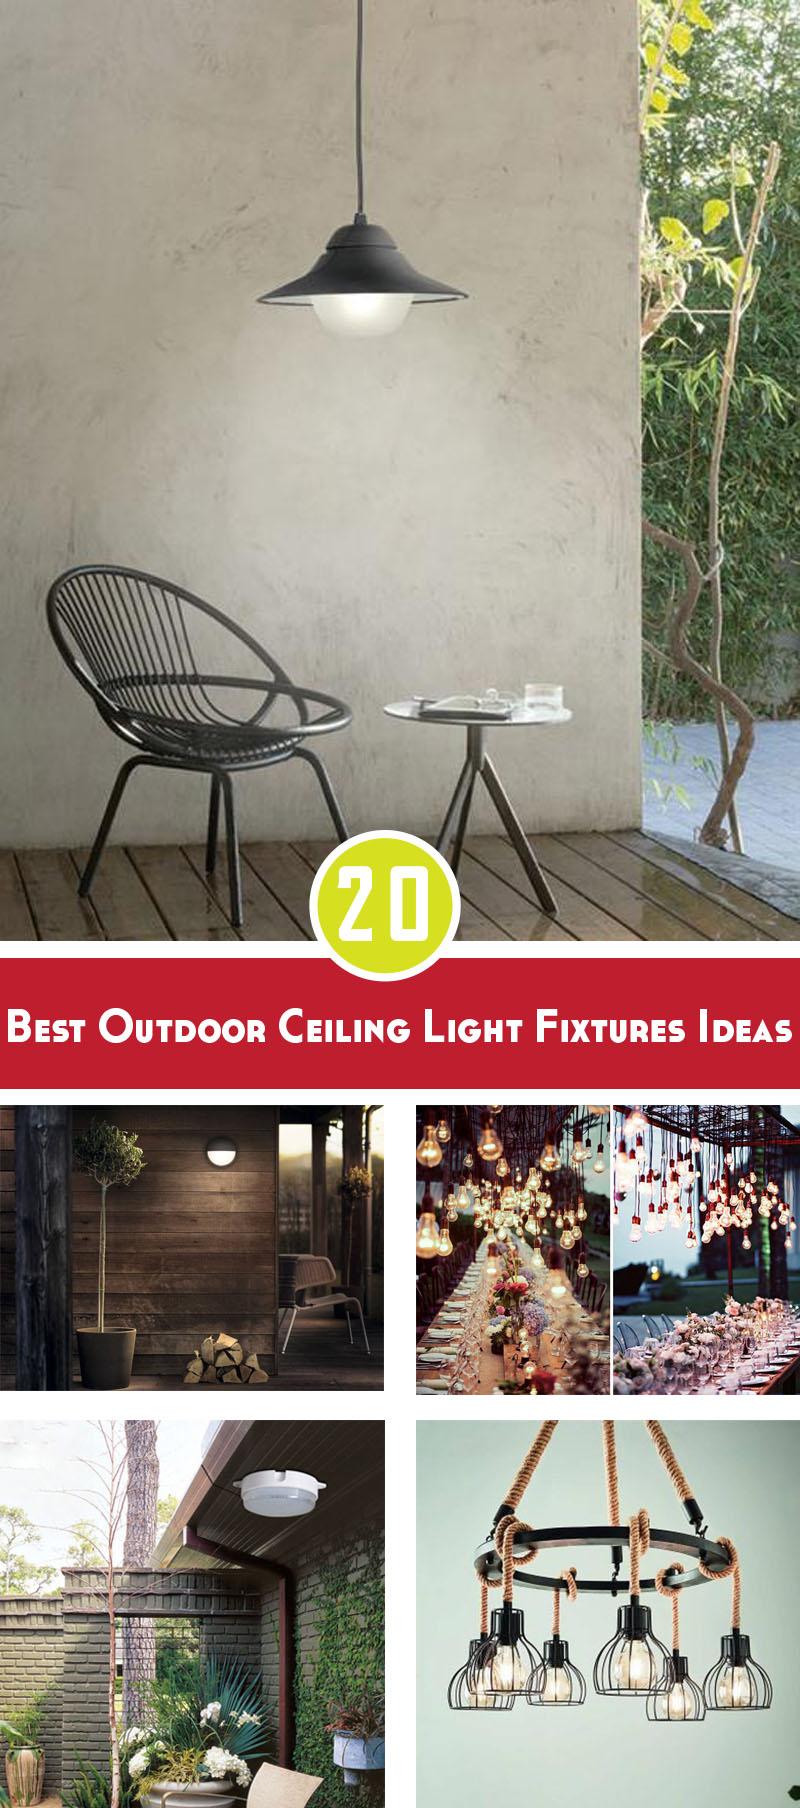 Best outdoor ceiling light fixtures ideas